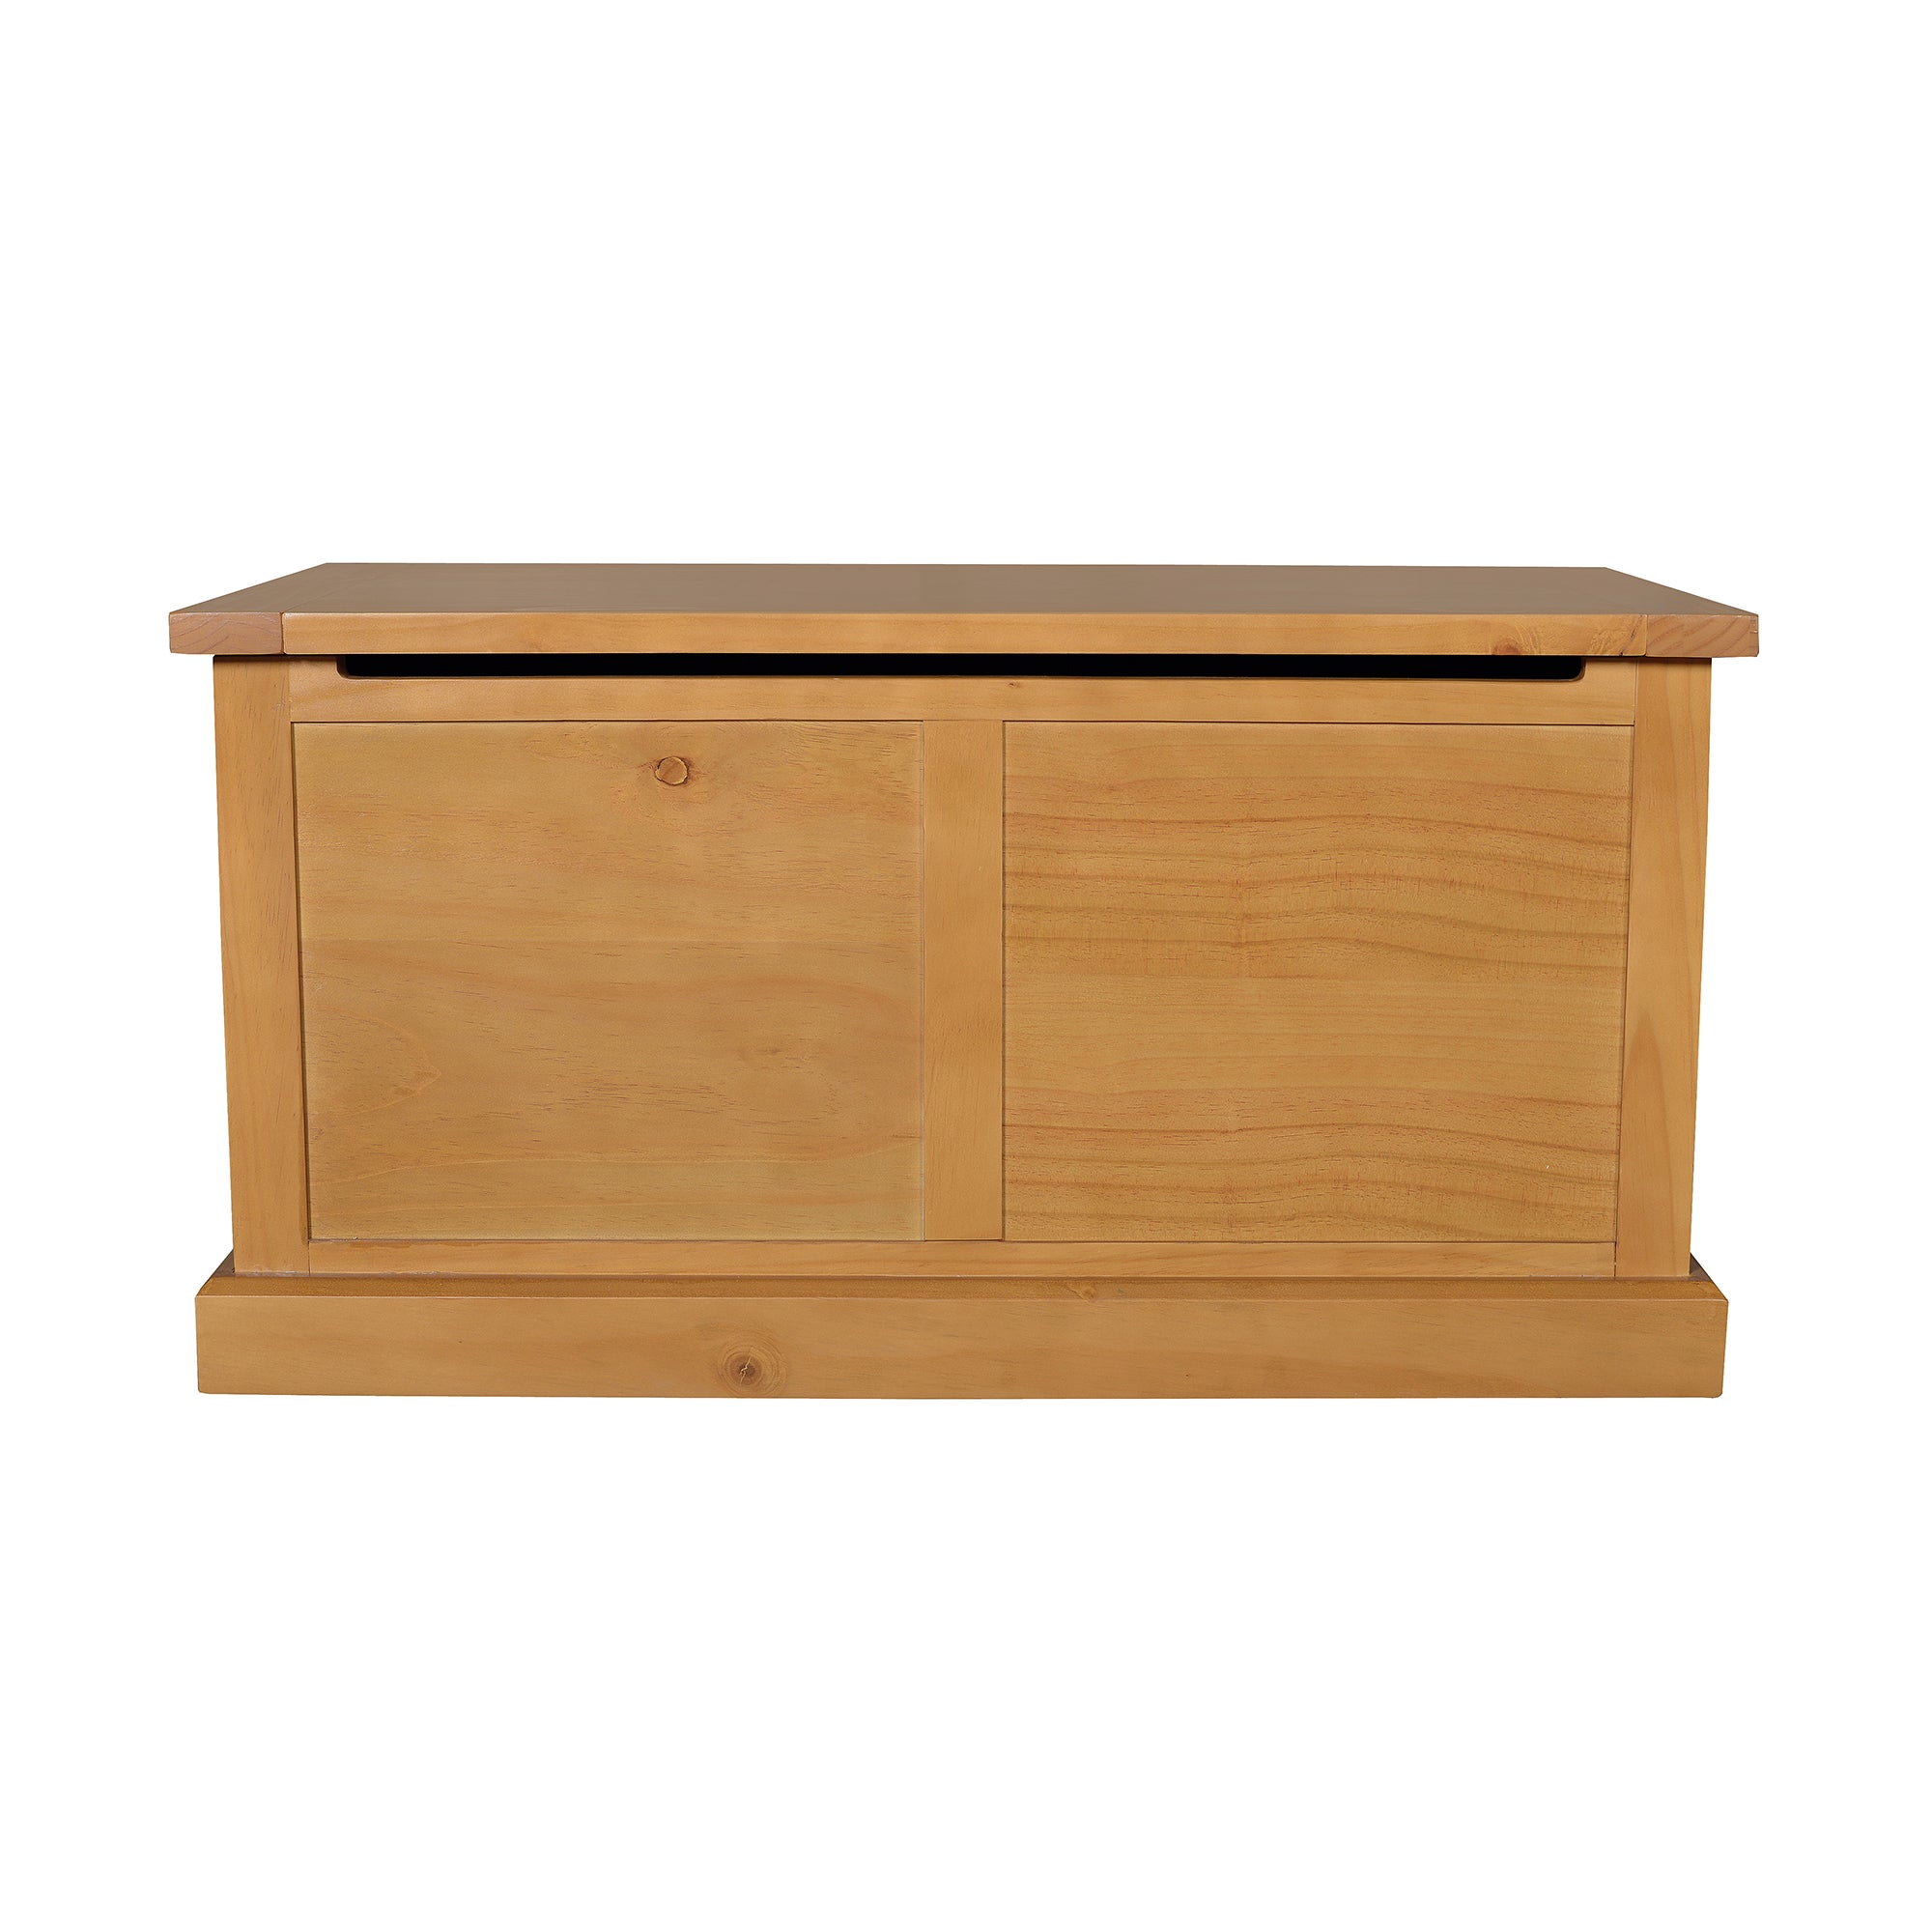 Newhaven Pine Blanket Box